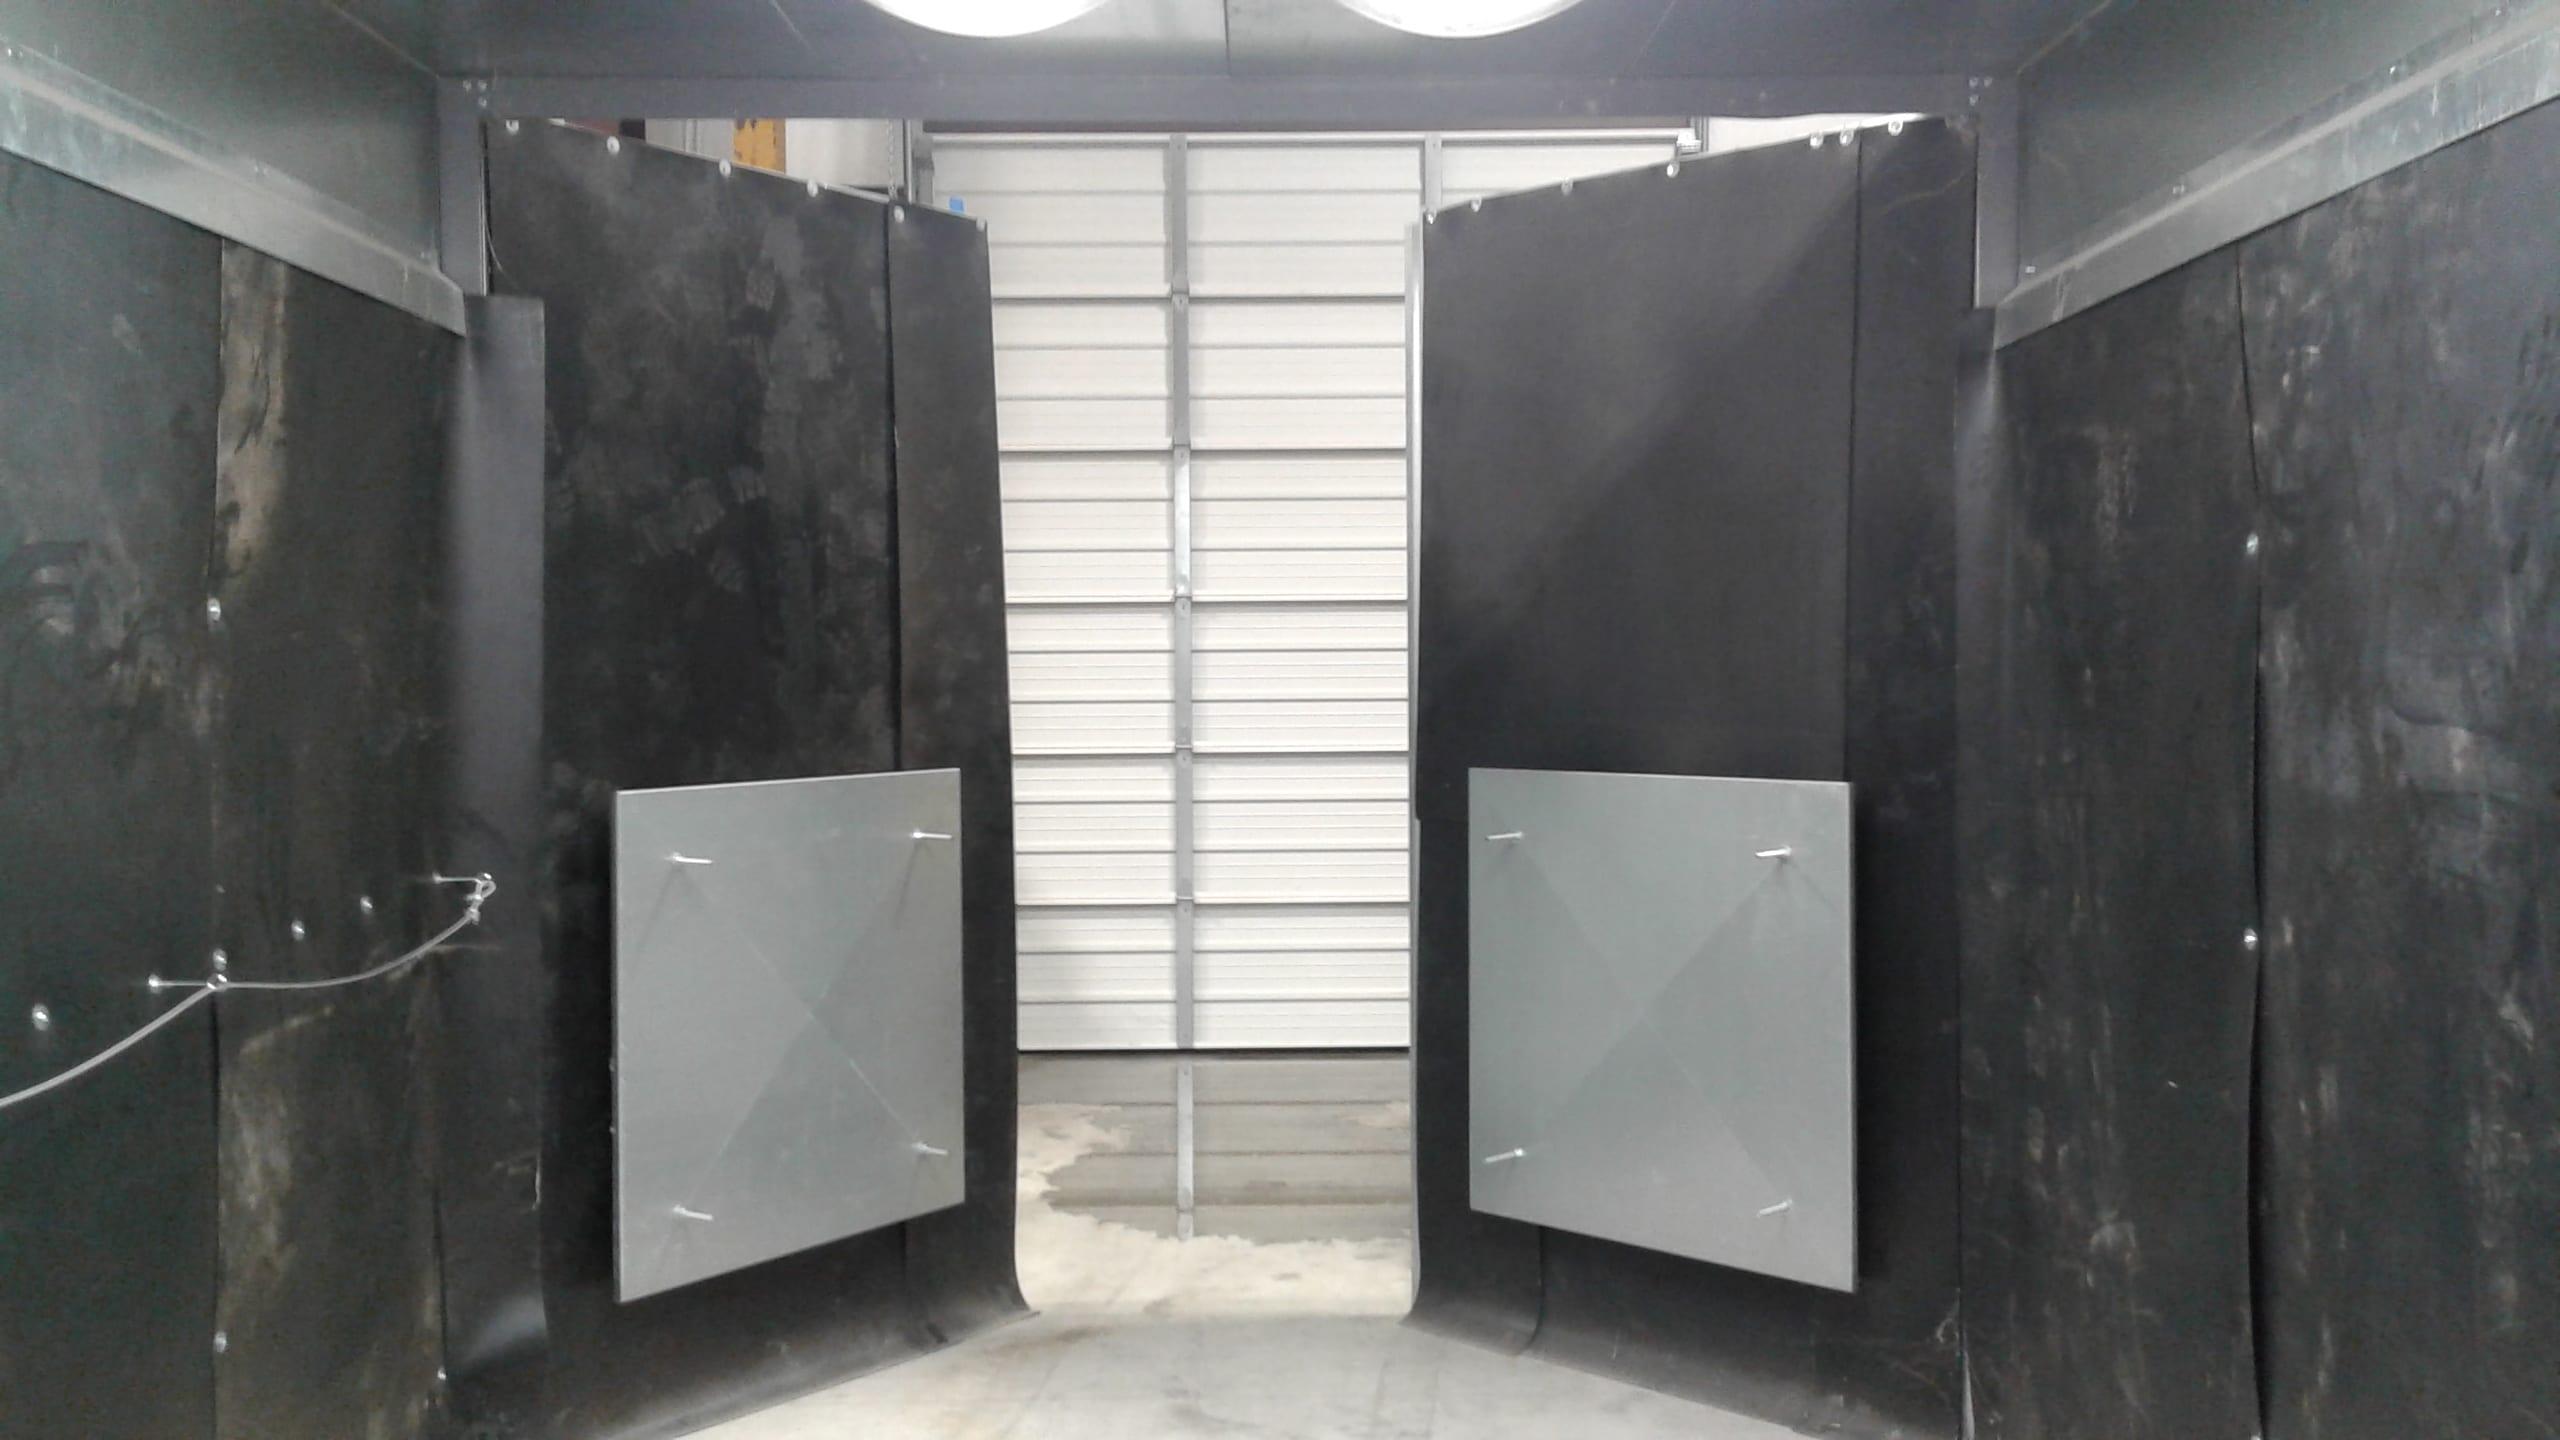 Sandblast Booth Air Inlet Plenums